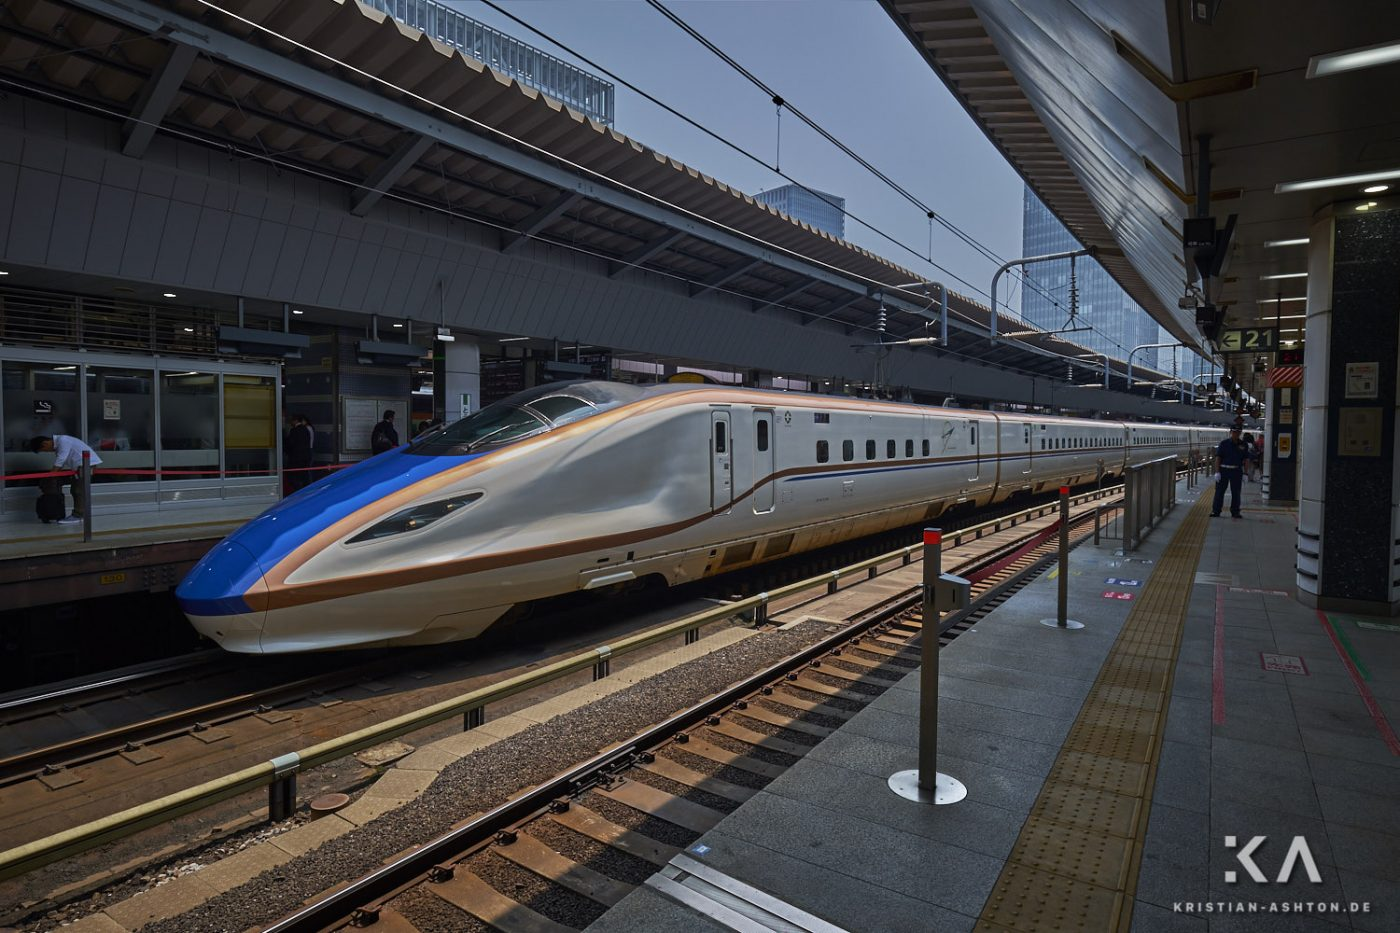 Tokyo station - a JR West Shinkansen train of series W7